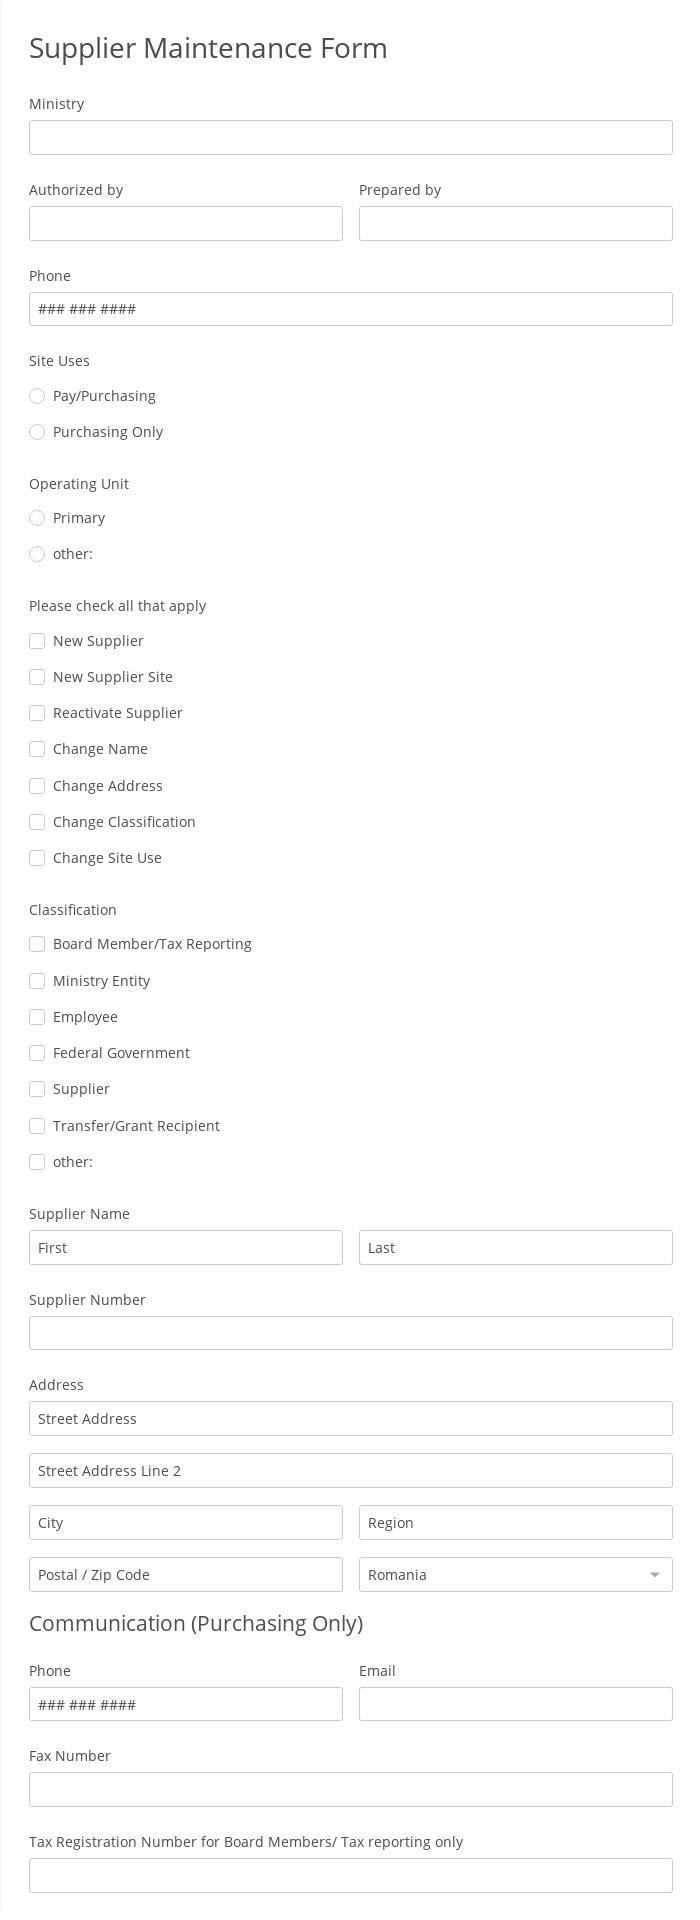 Supplier Maintenance Form